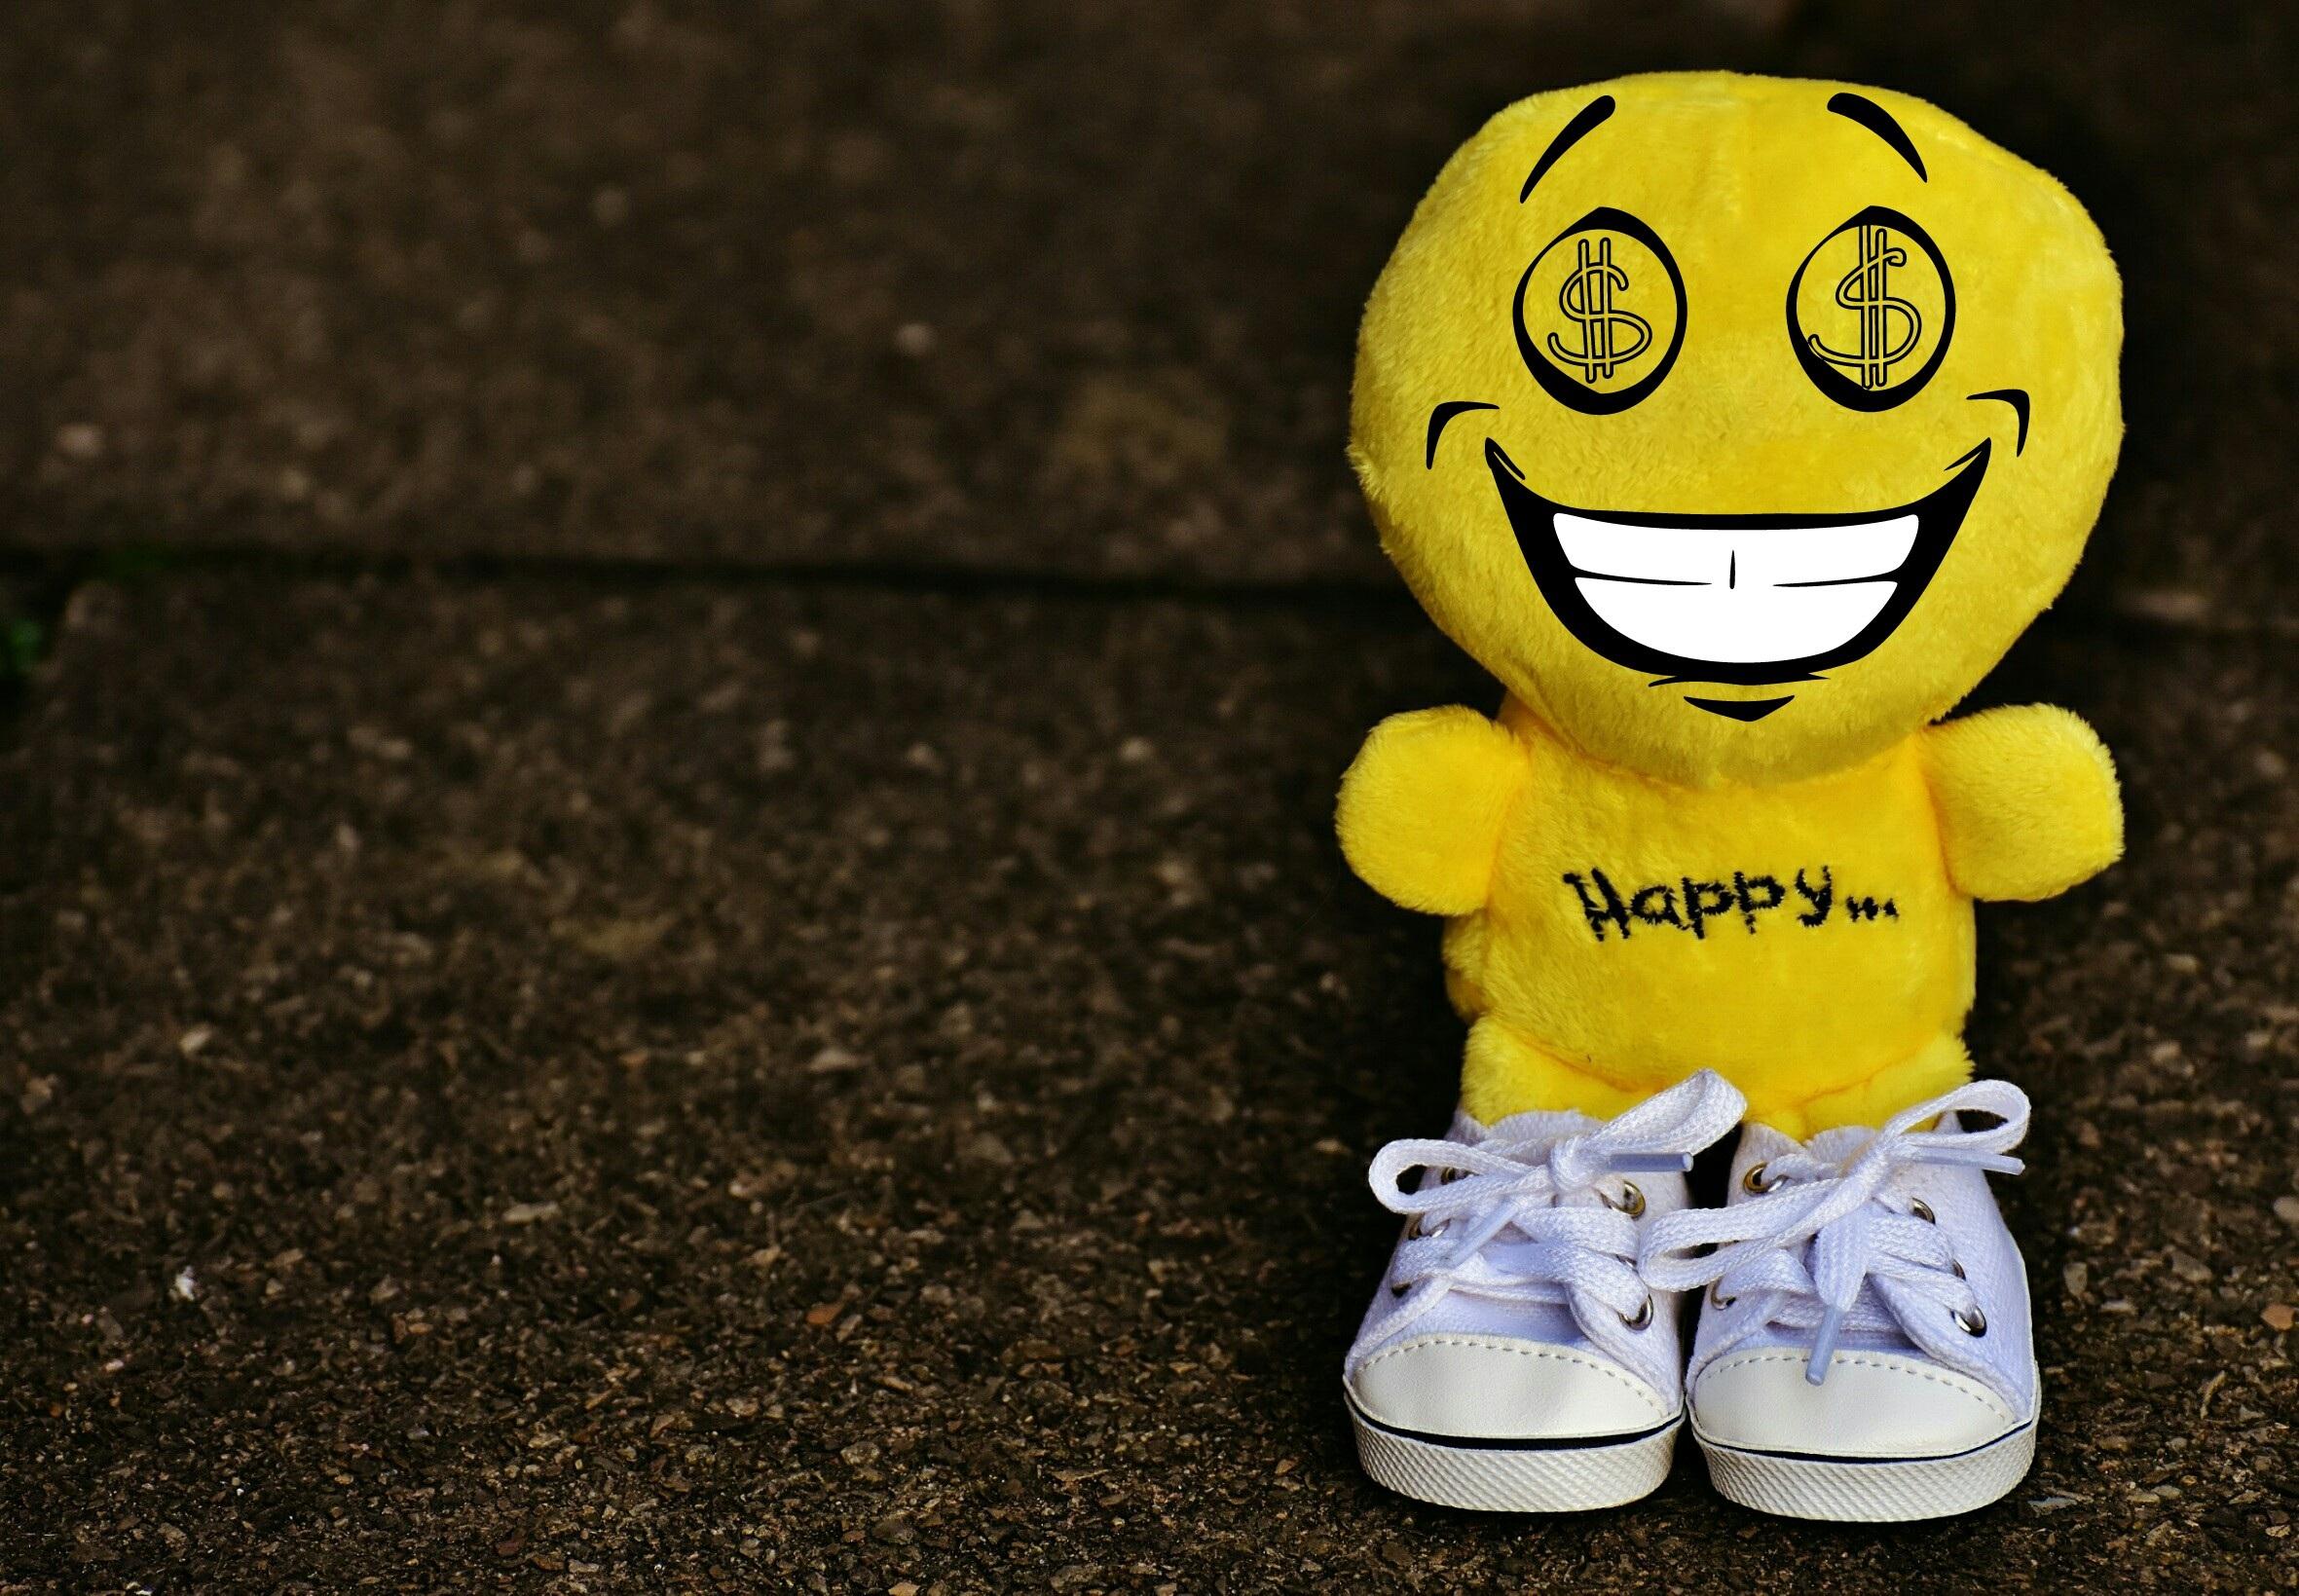 Gambar Manis Imut Hijau Kuning Mainan Mulai Senang Sepatu